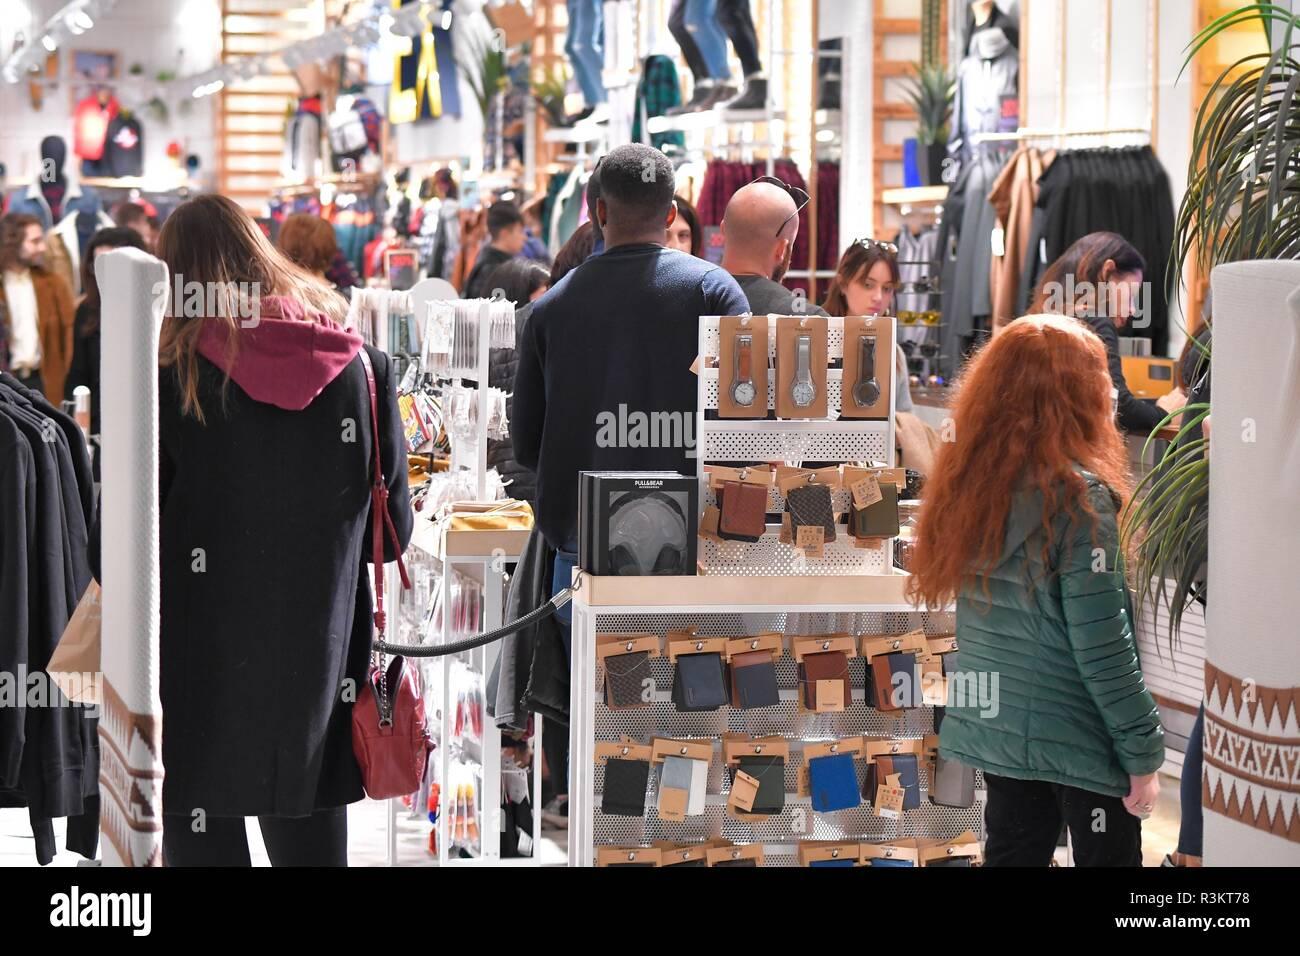 Sconti Stockfotos & Sconti Bilder - Alamy